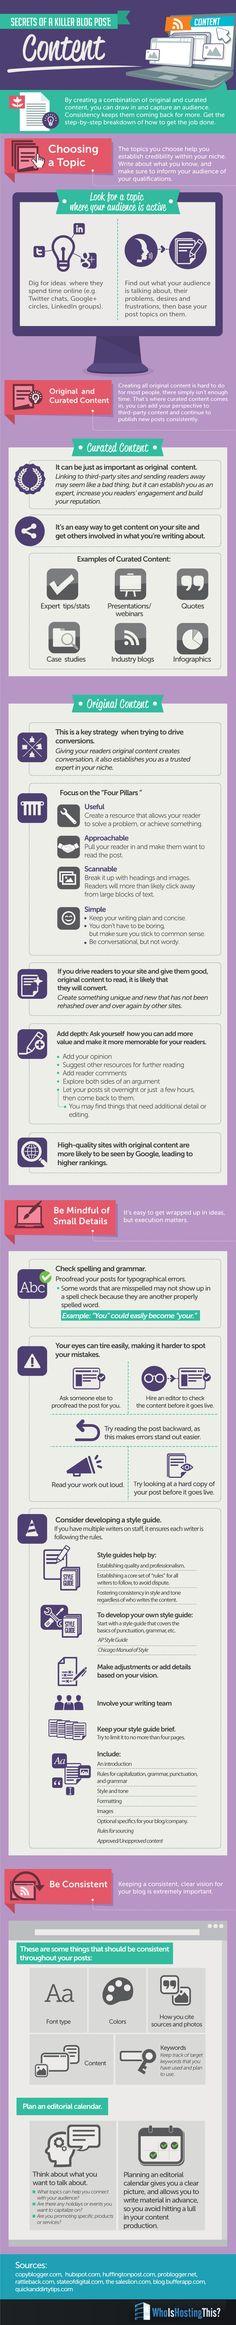 secrets of a Killer Blog Post: Content #infographic